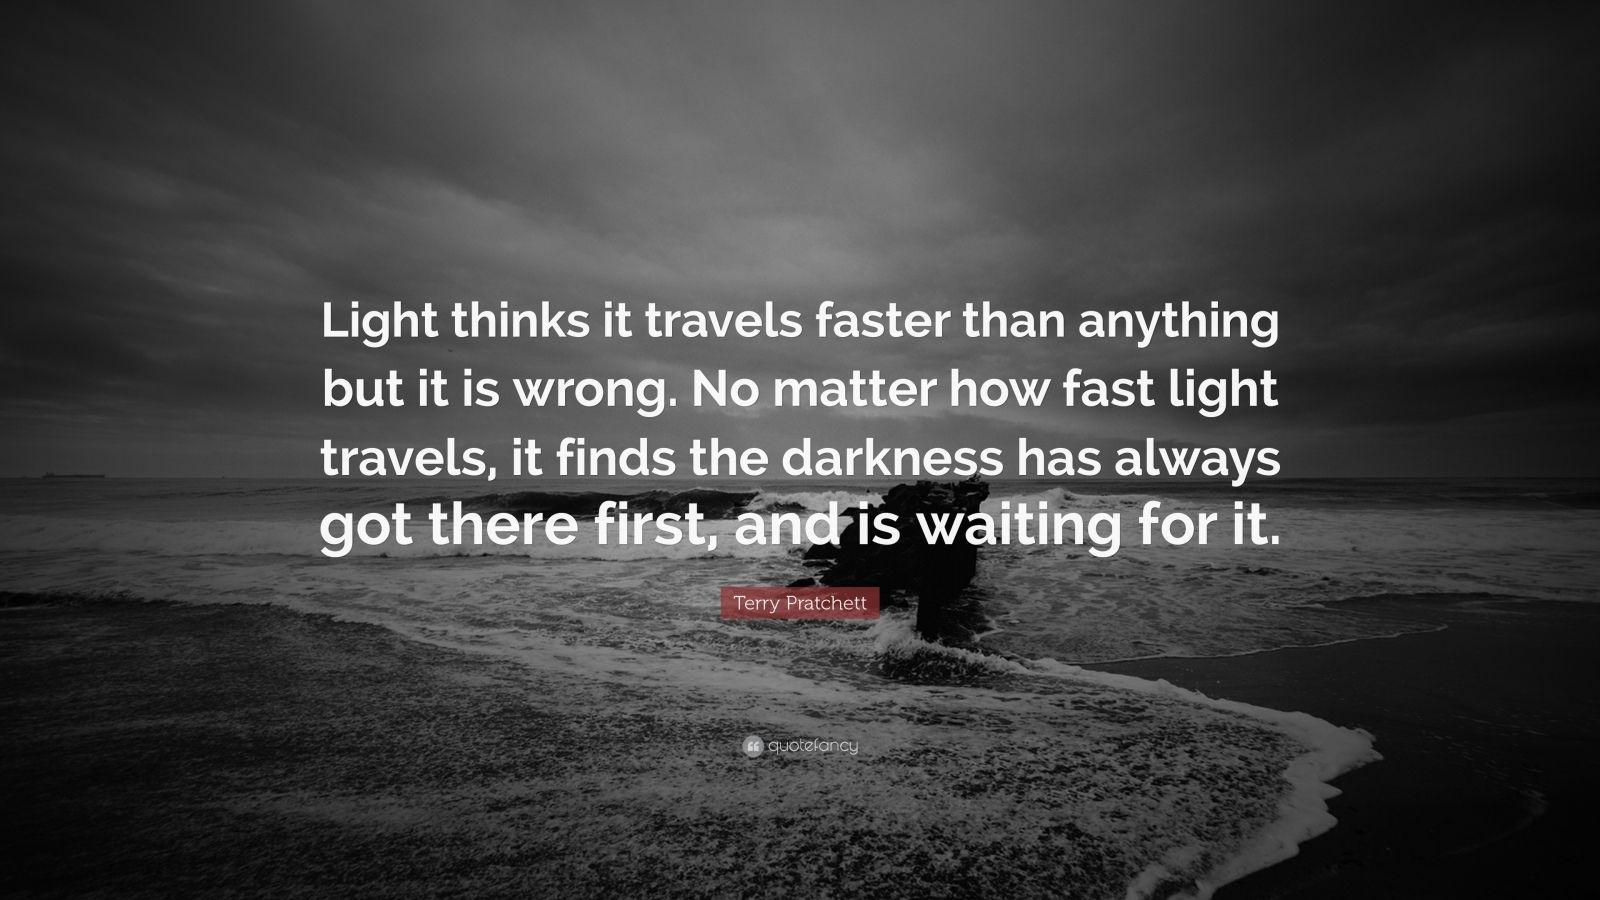 Terry Pratchett Quote Light Thinks It Travels Faster